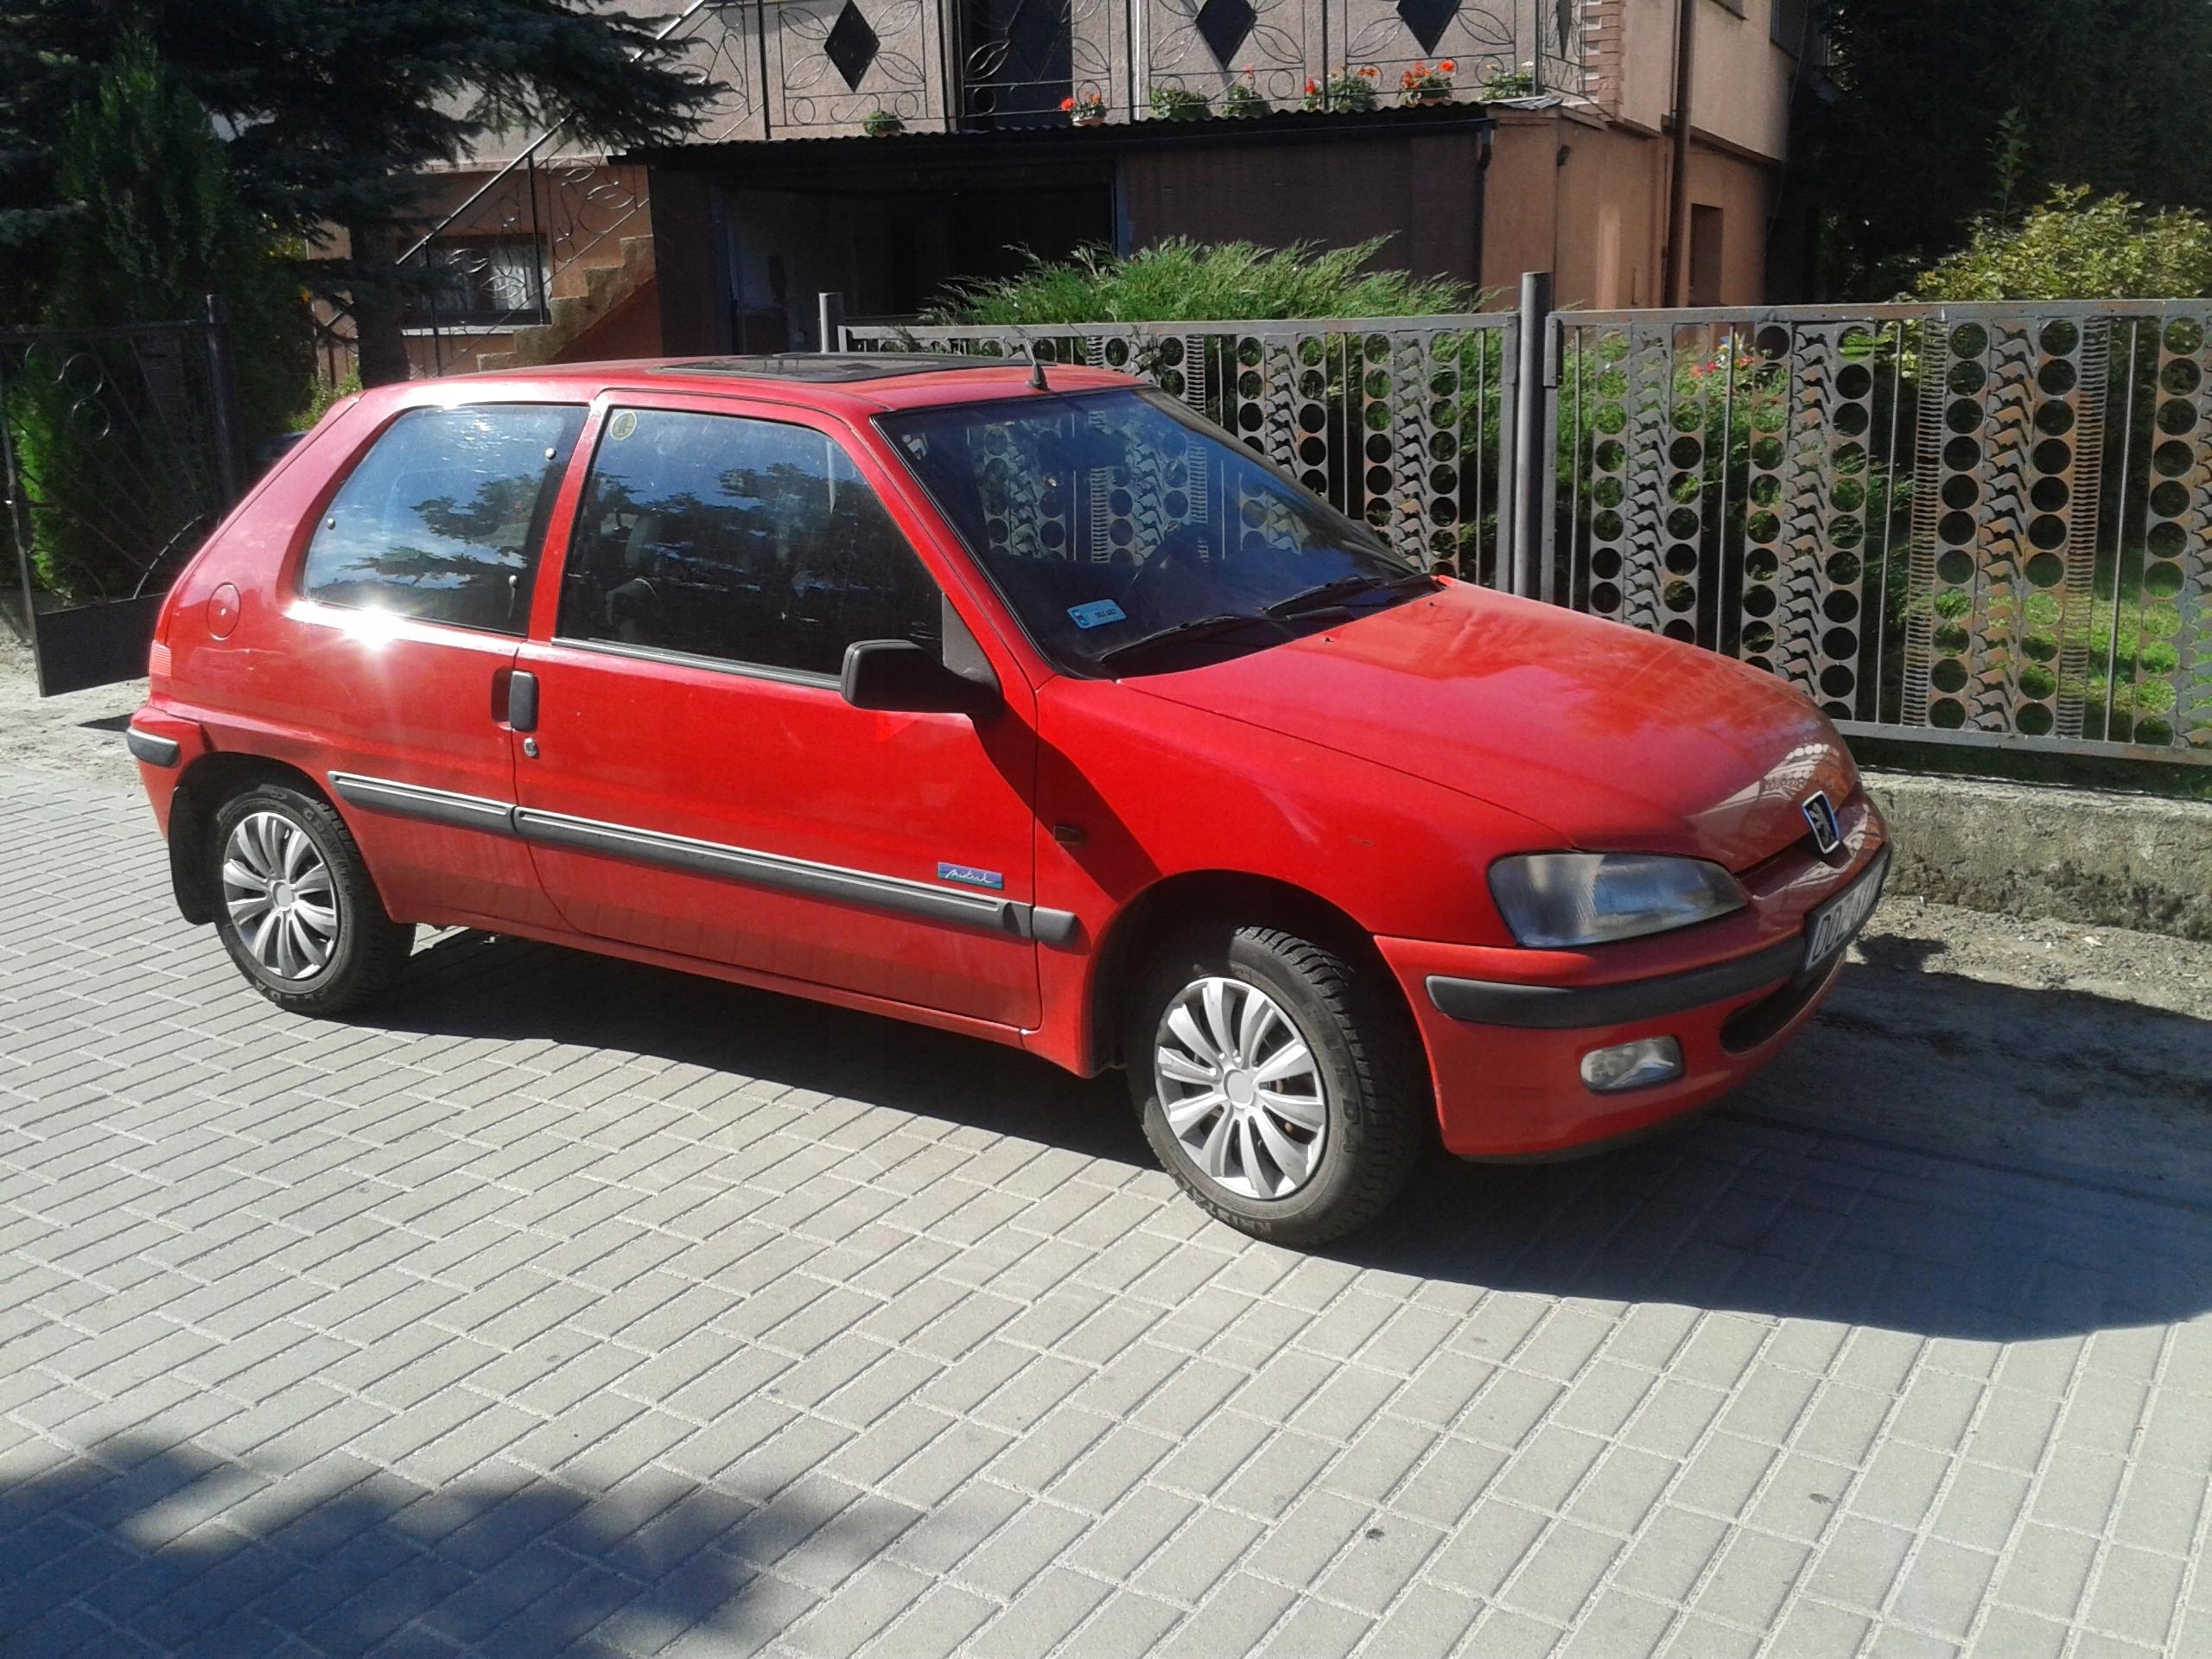 Samochód osobowy PEUGEOT 106 1999r